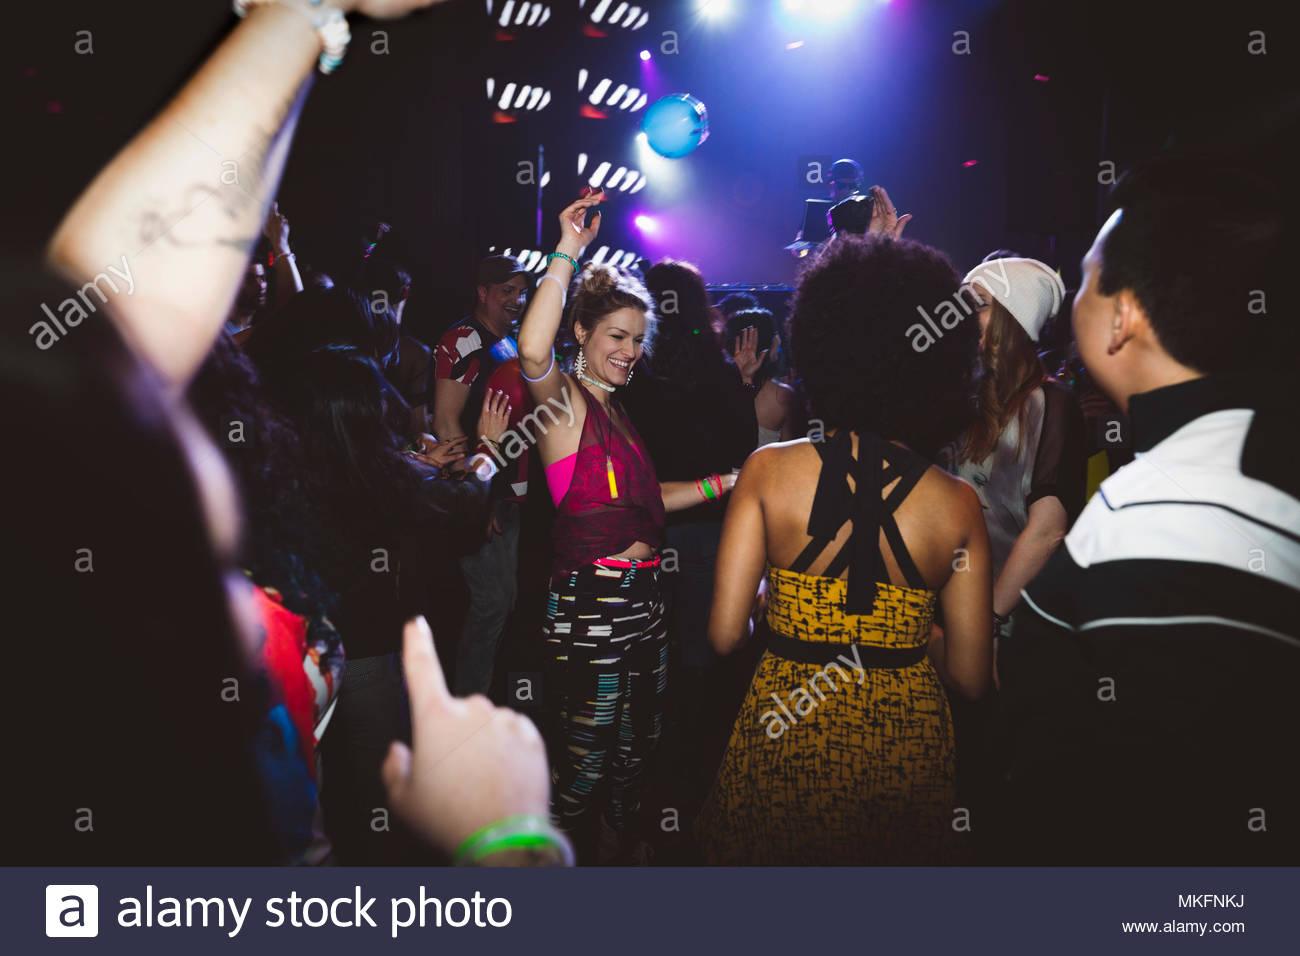 Millennial friends dancing, partying in nightclub - Stock Image